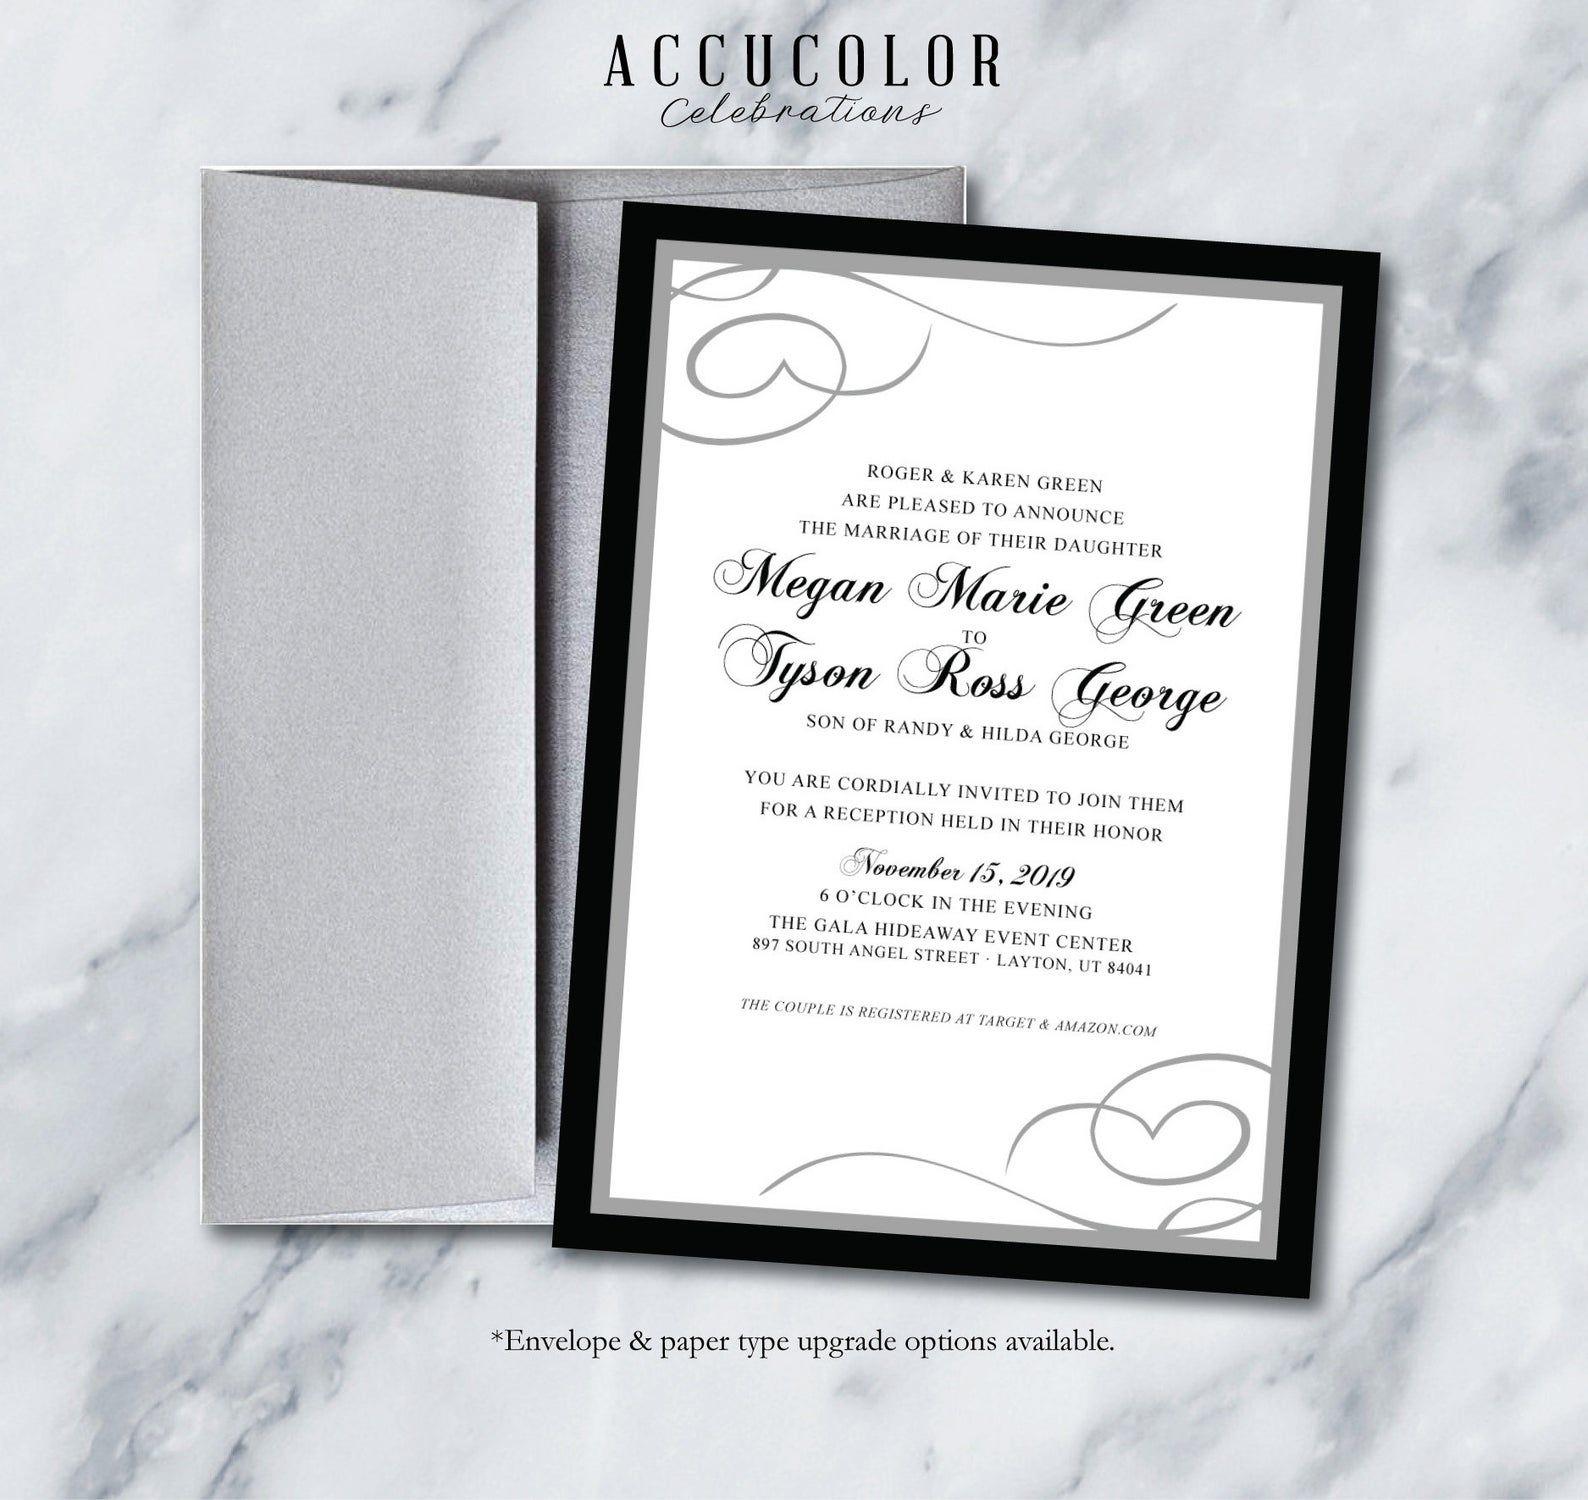 Blackwhite Wedding Invitation Megan Invite Design Digital Or Printable Blackandwhite Tangreyblack Monotoneinvite In 2020 Invitations Wedding Invitations Black And White Wedding Invitations